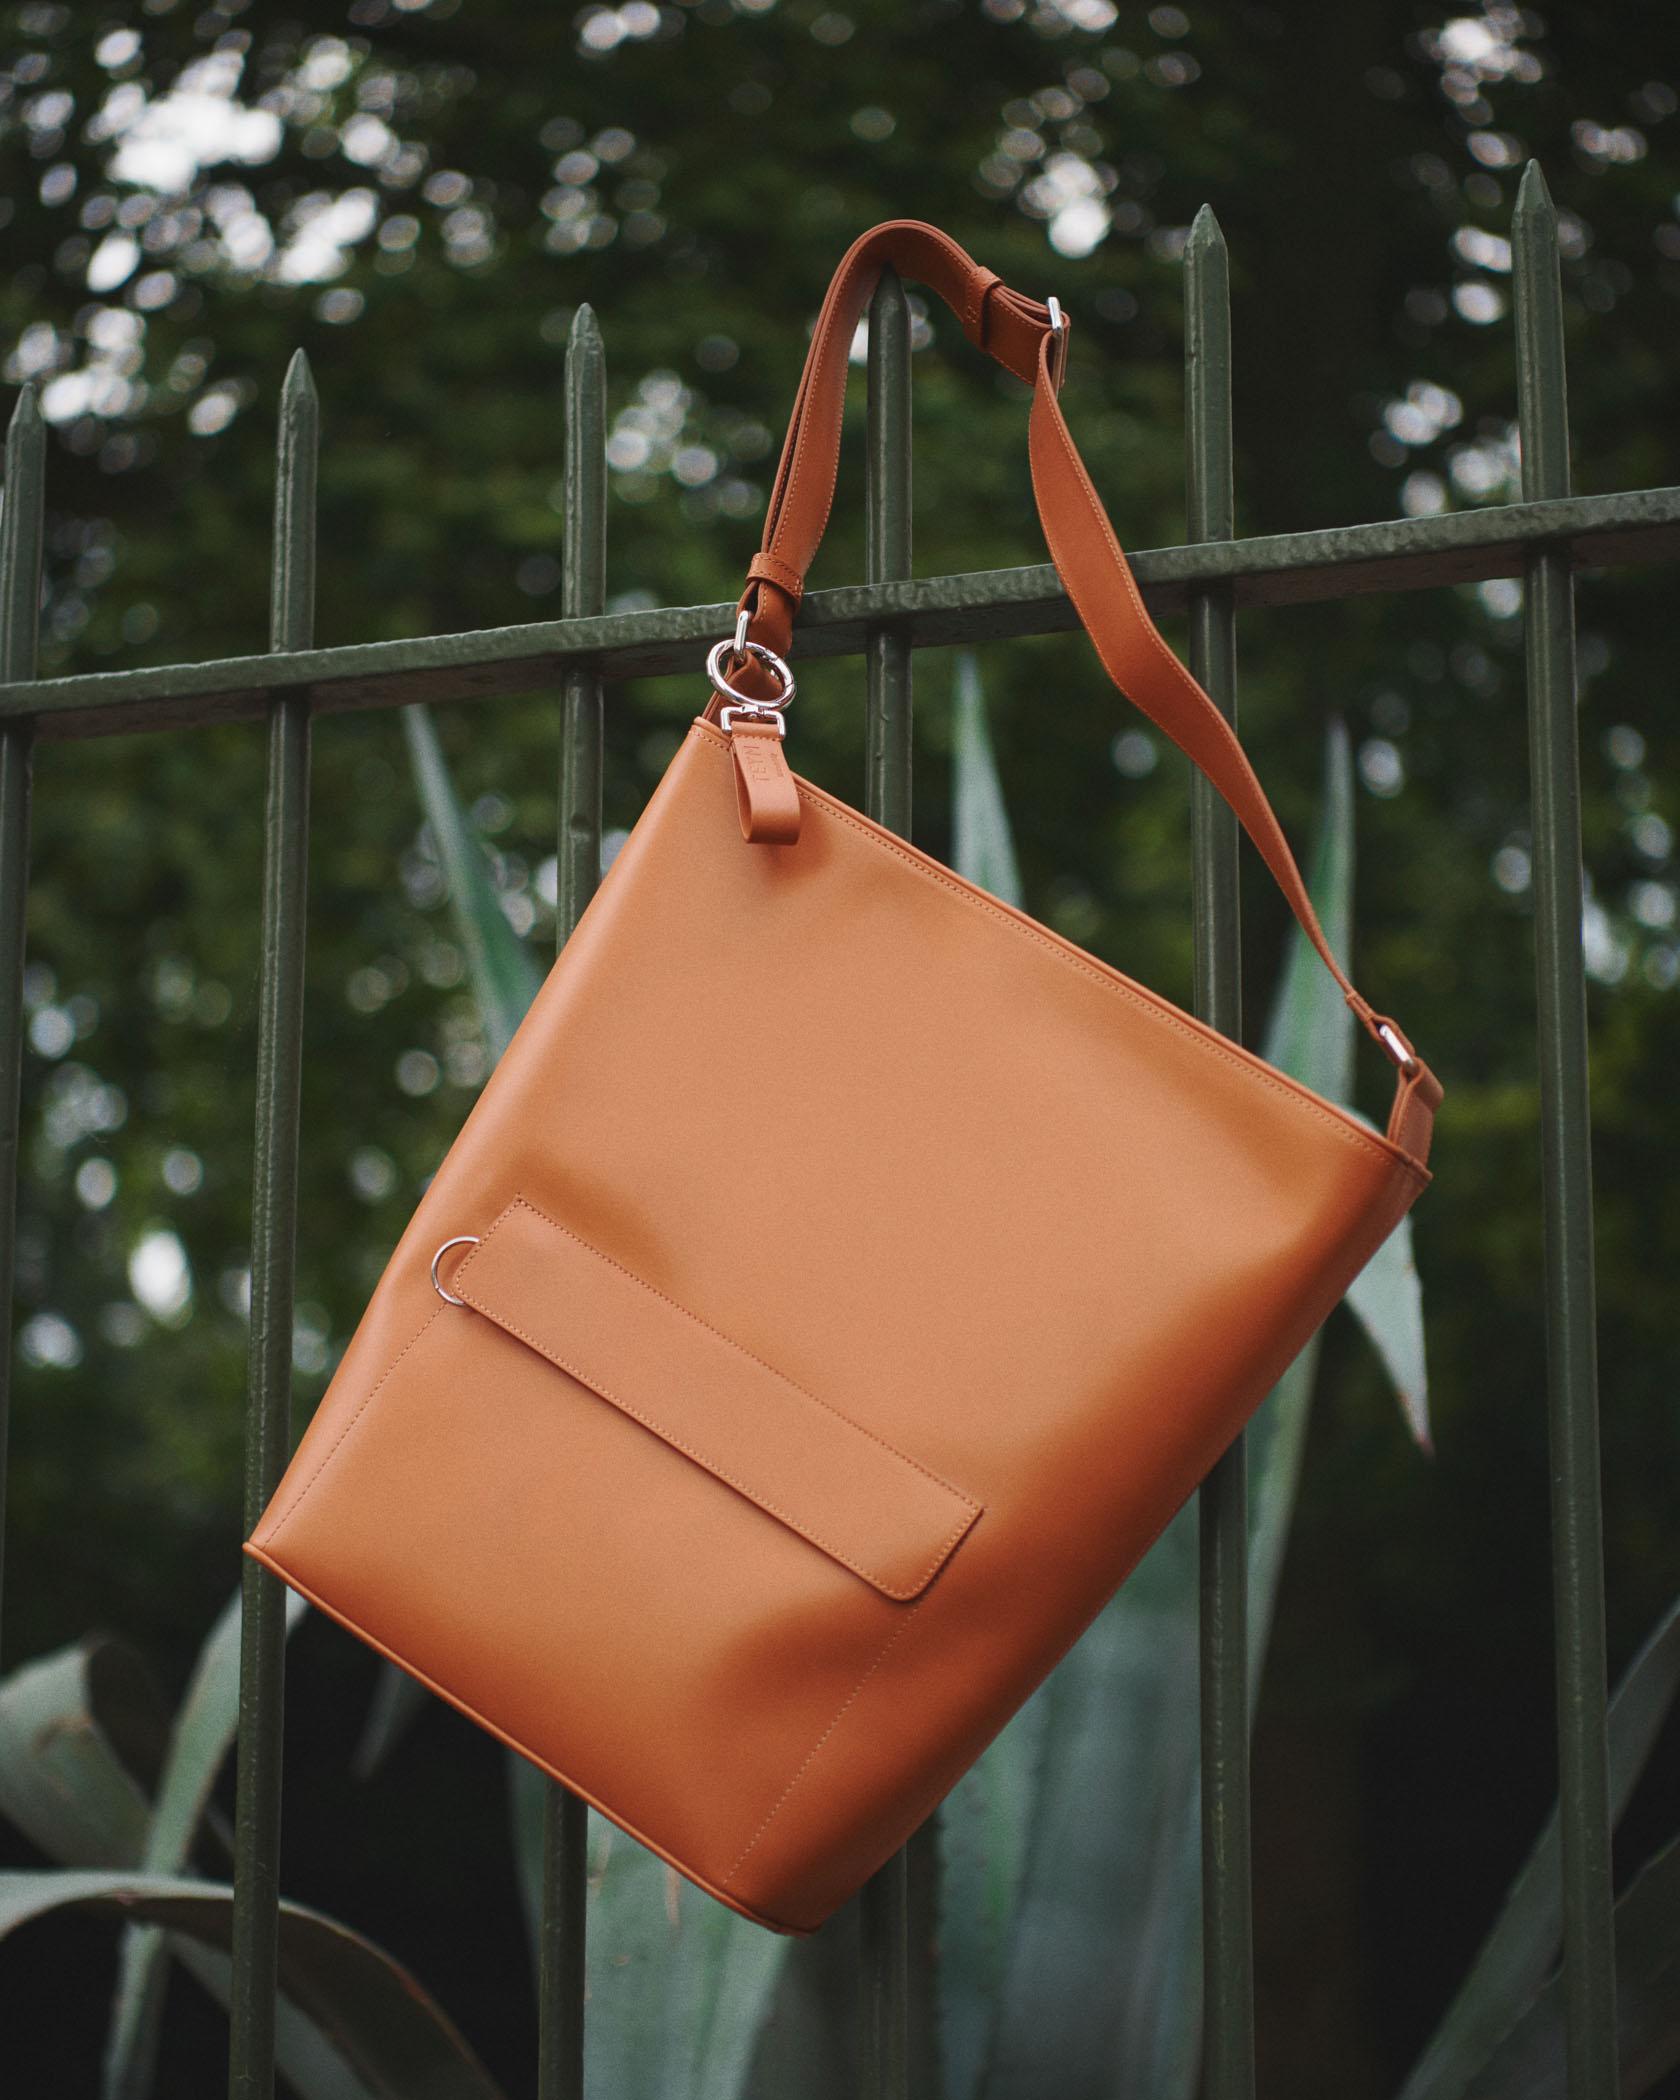 Teym - The Bag - Women - 1